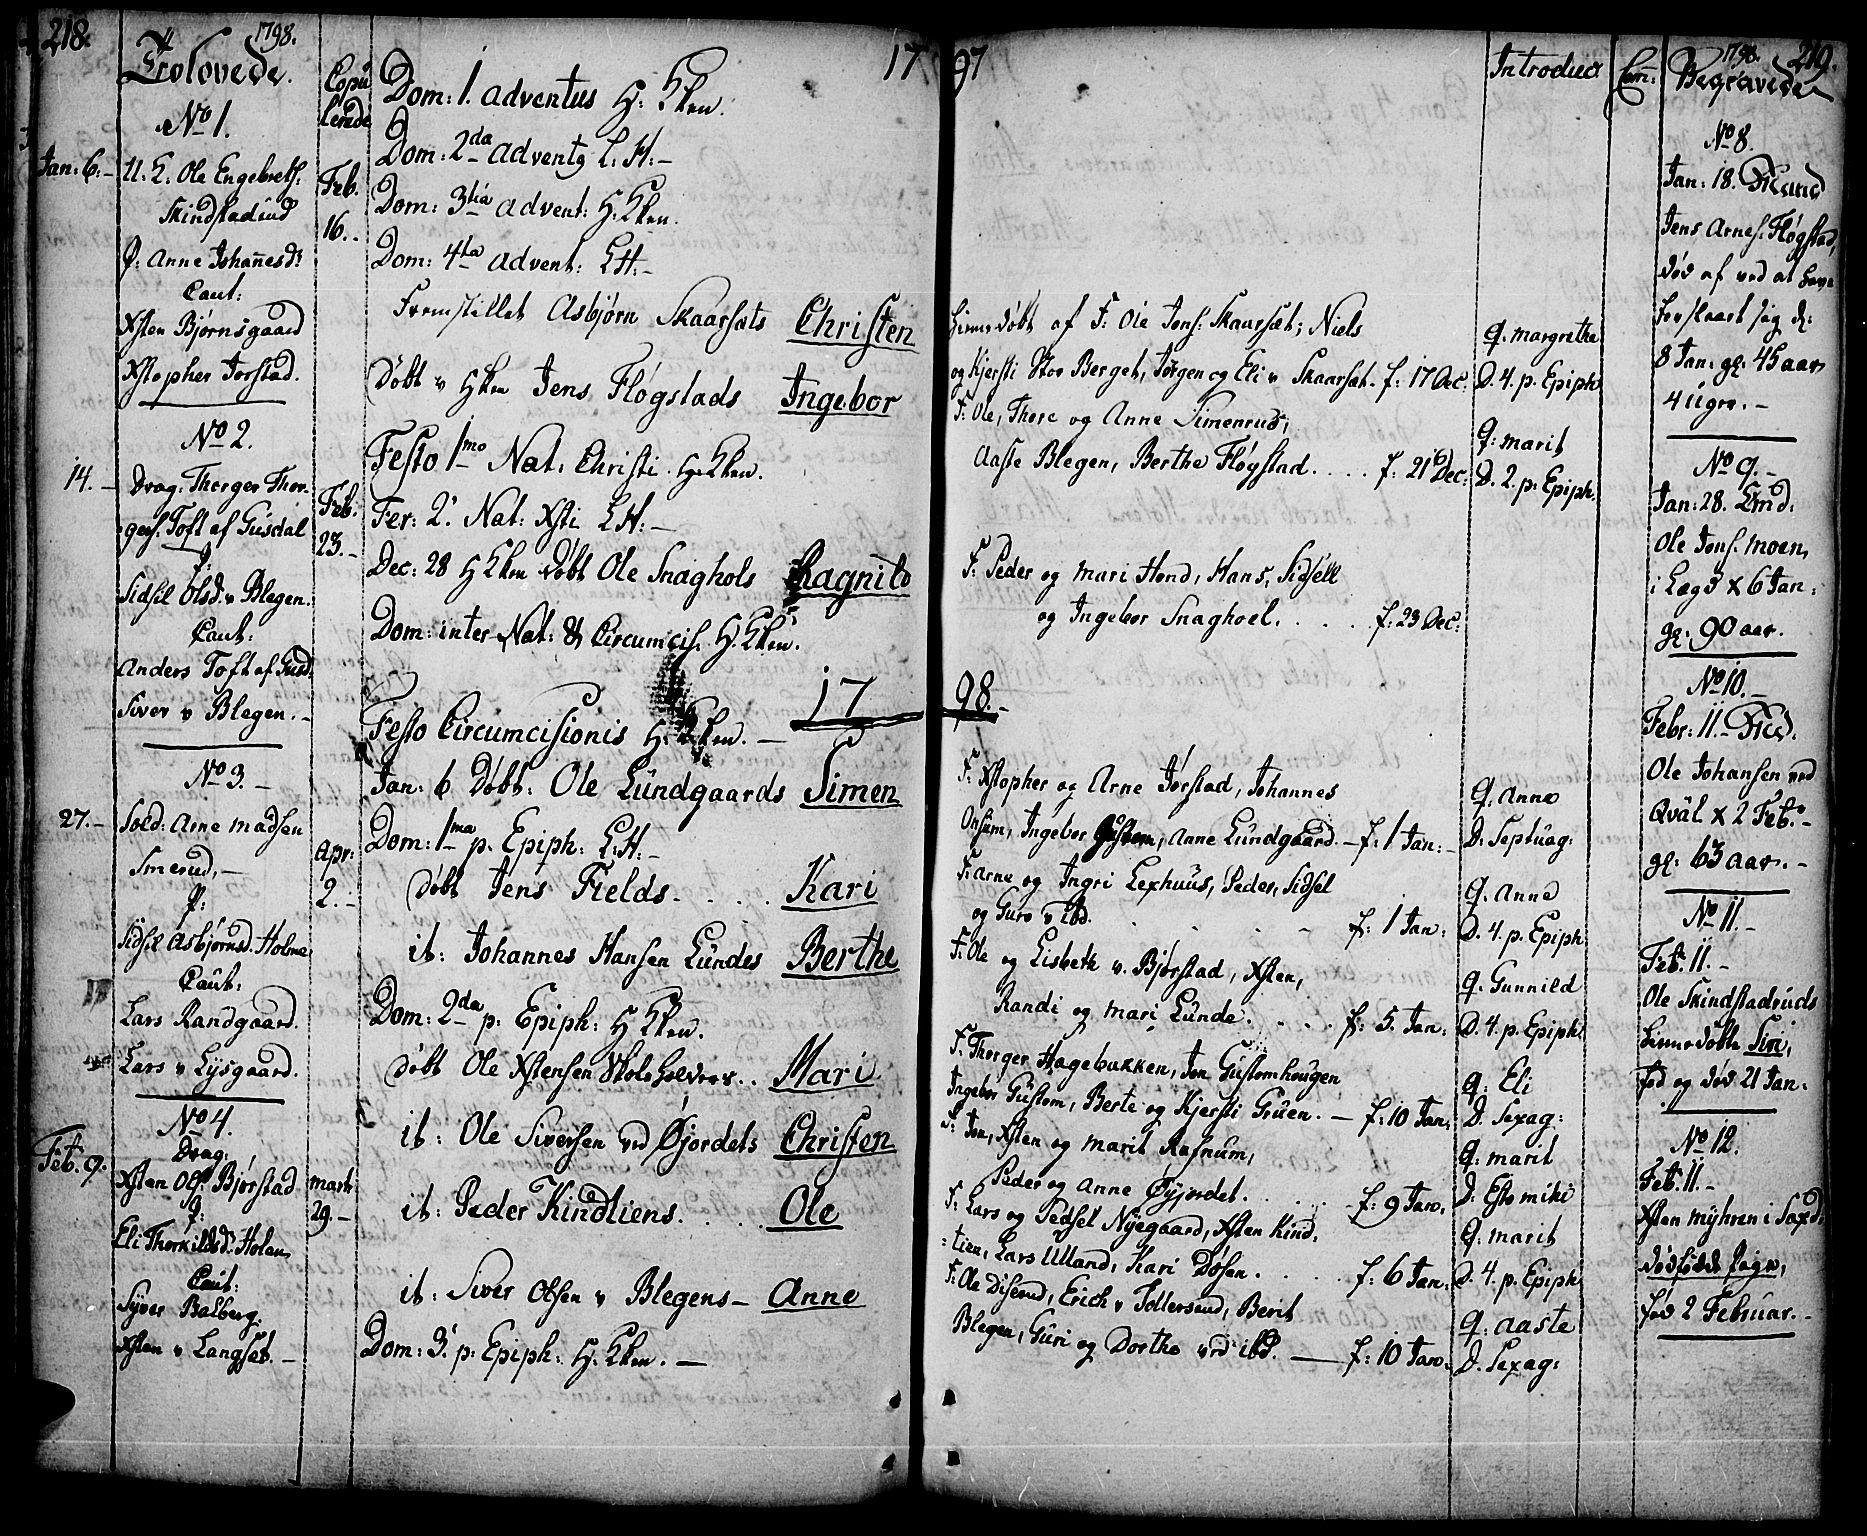 SAH, Fåberg prestekontor, Ministerialbok nr. 2, 1775-1818, s. 218-219